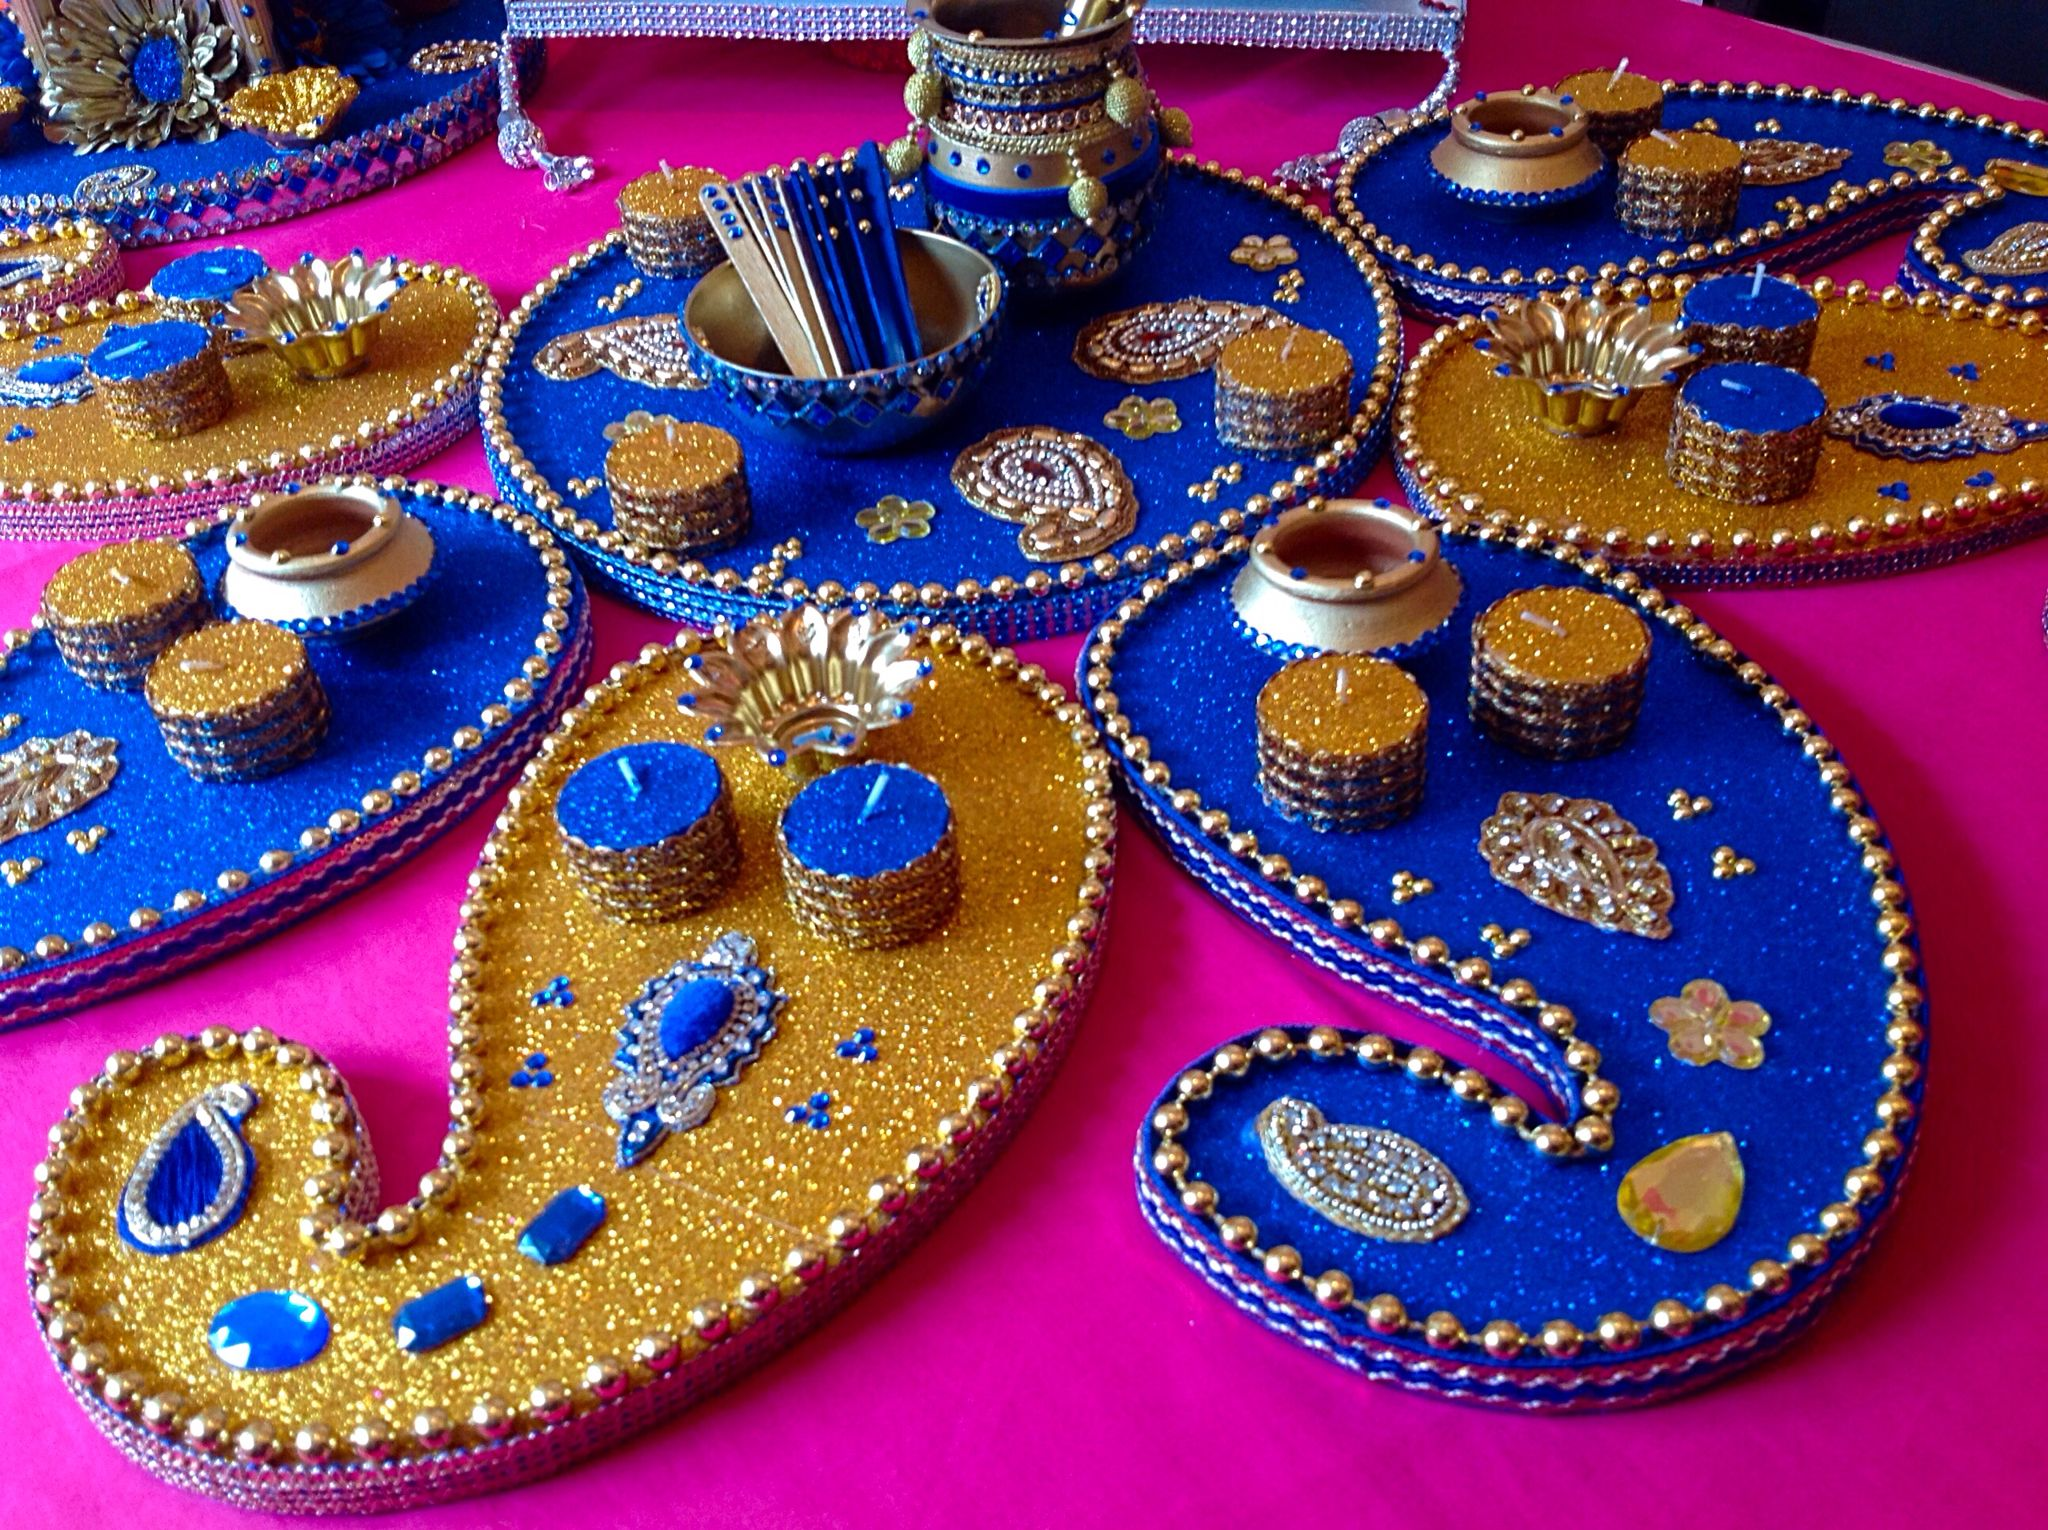 Mehndi Plates Uk : Royal blue and gold elegant mehndi plates. see www.facebook.com